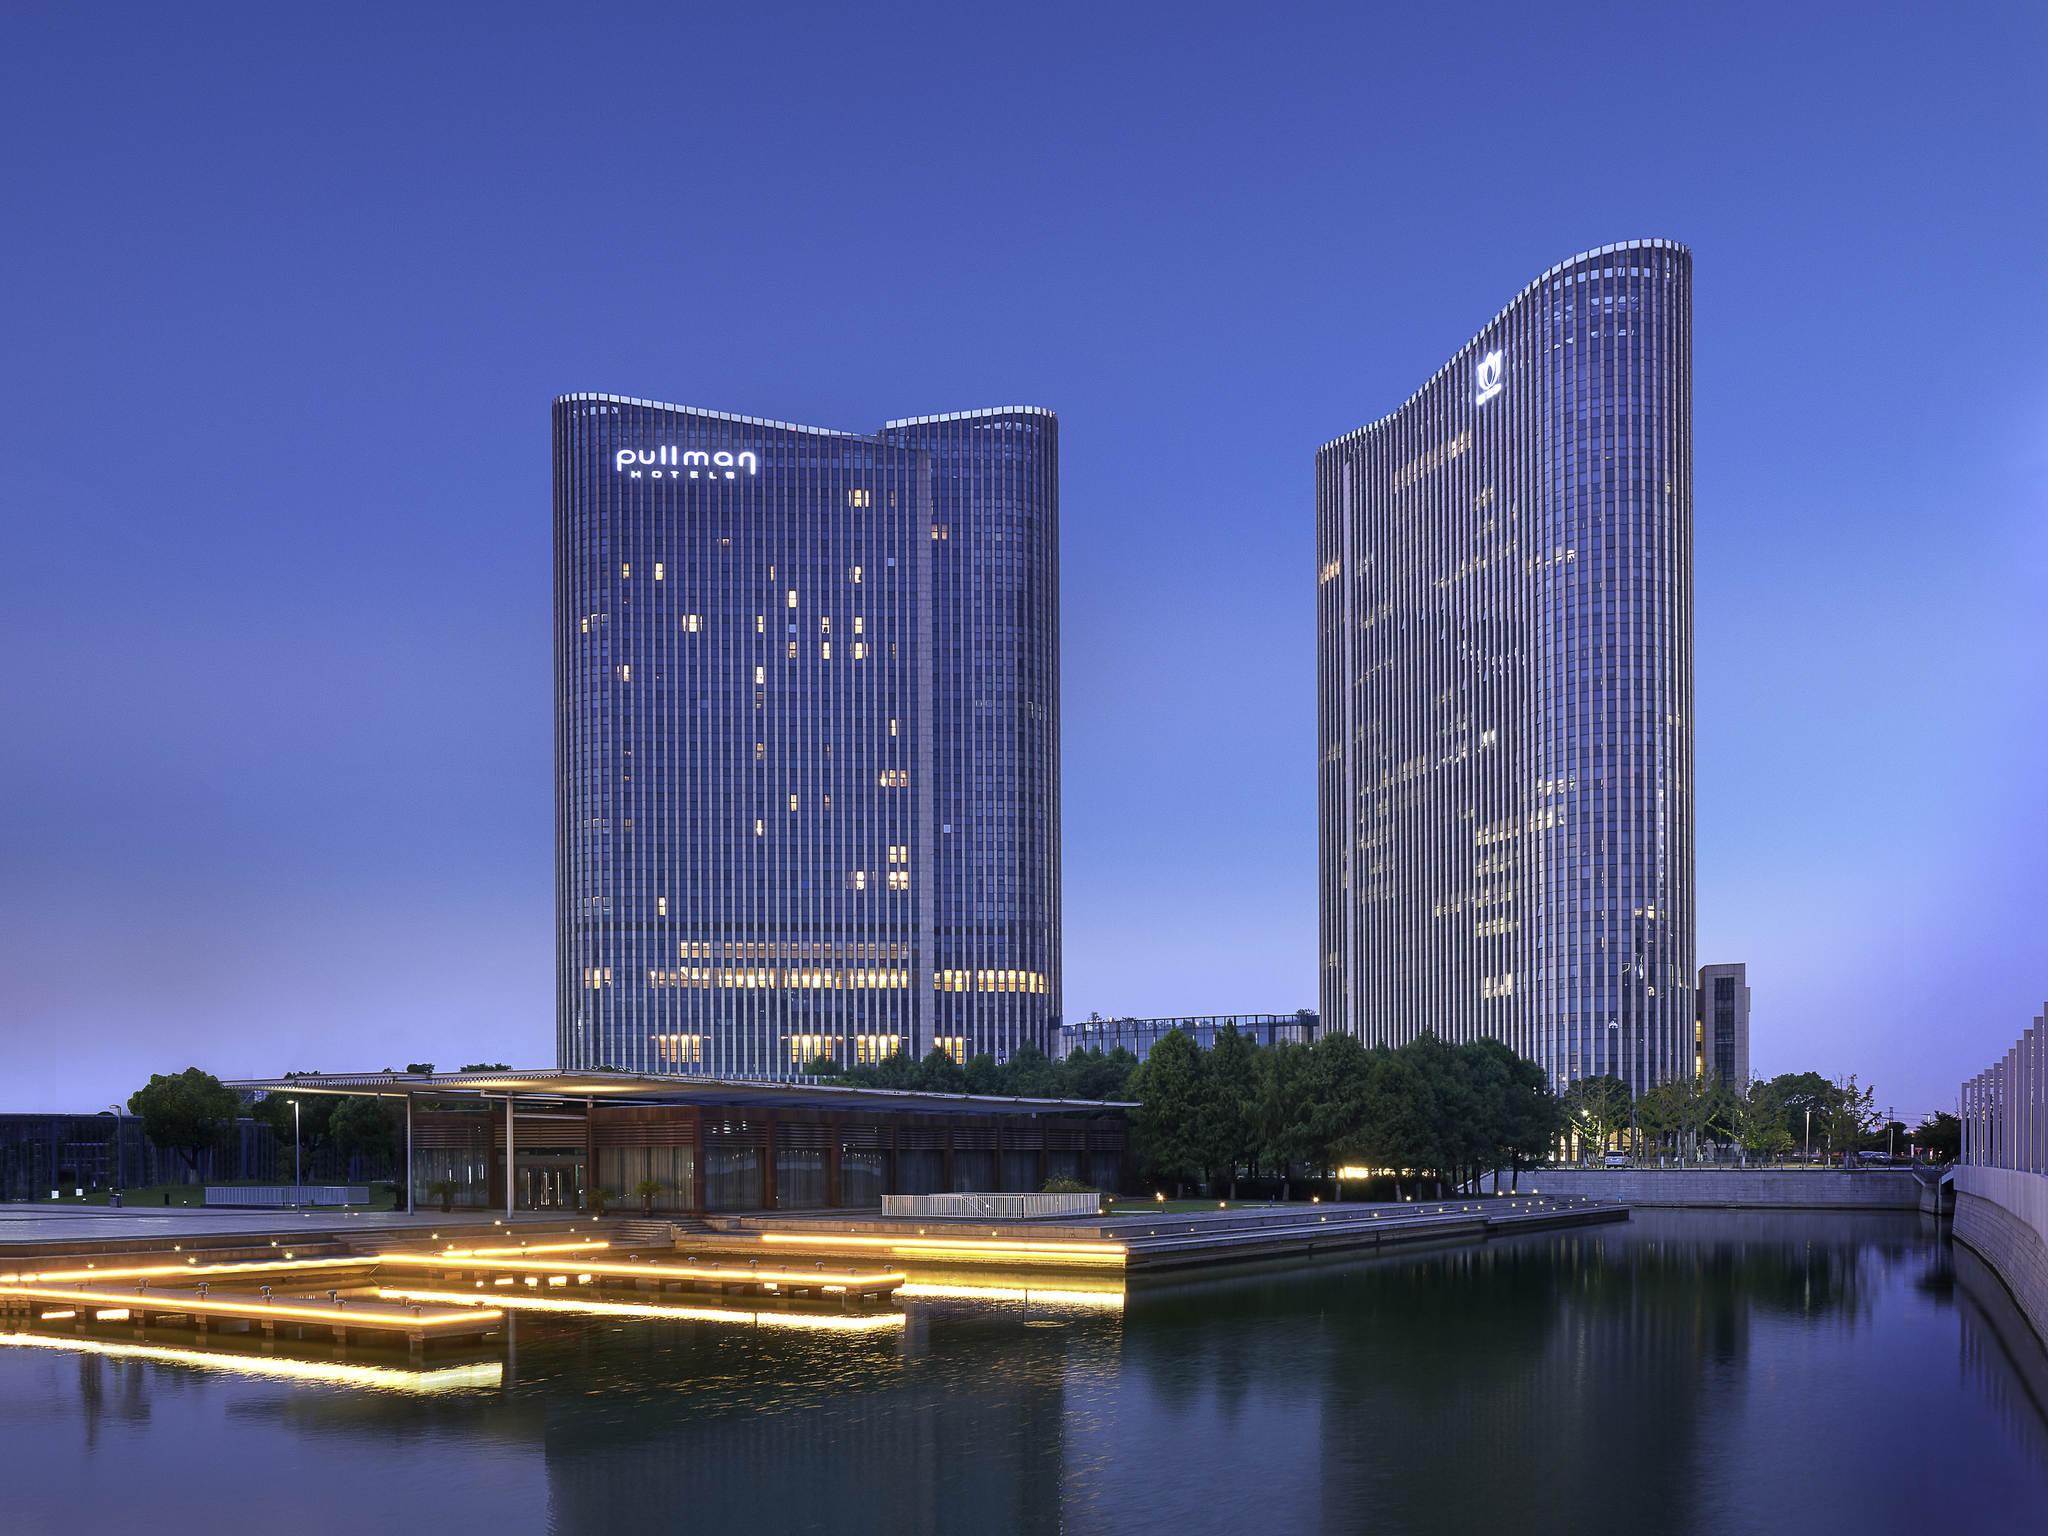 Hotel – Pullman Wuxi New Lake